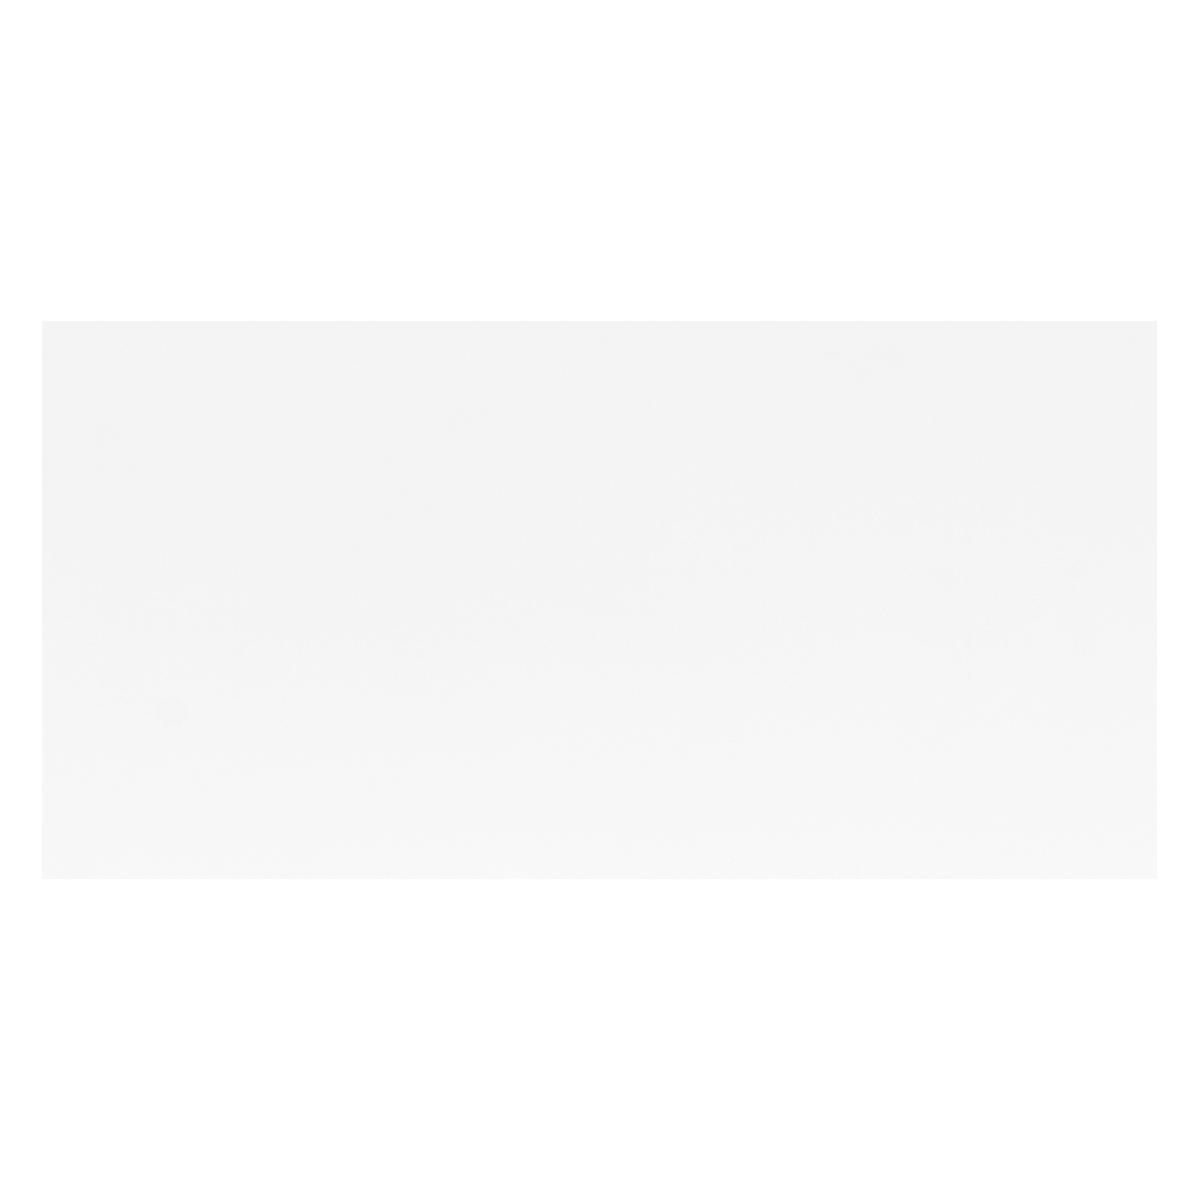 Mayólica Blanco Mate - 30X60 cm - 1.44 m2